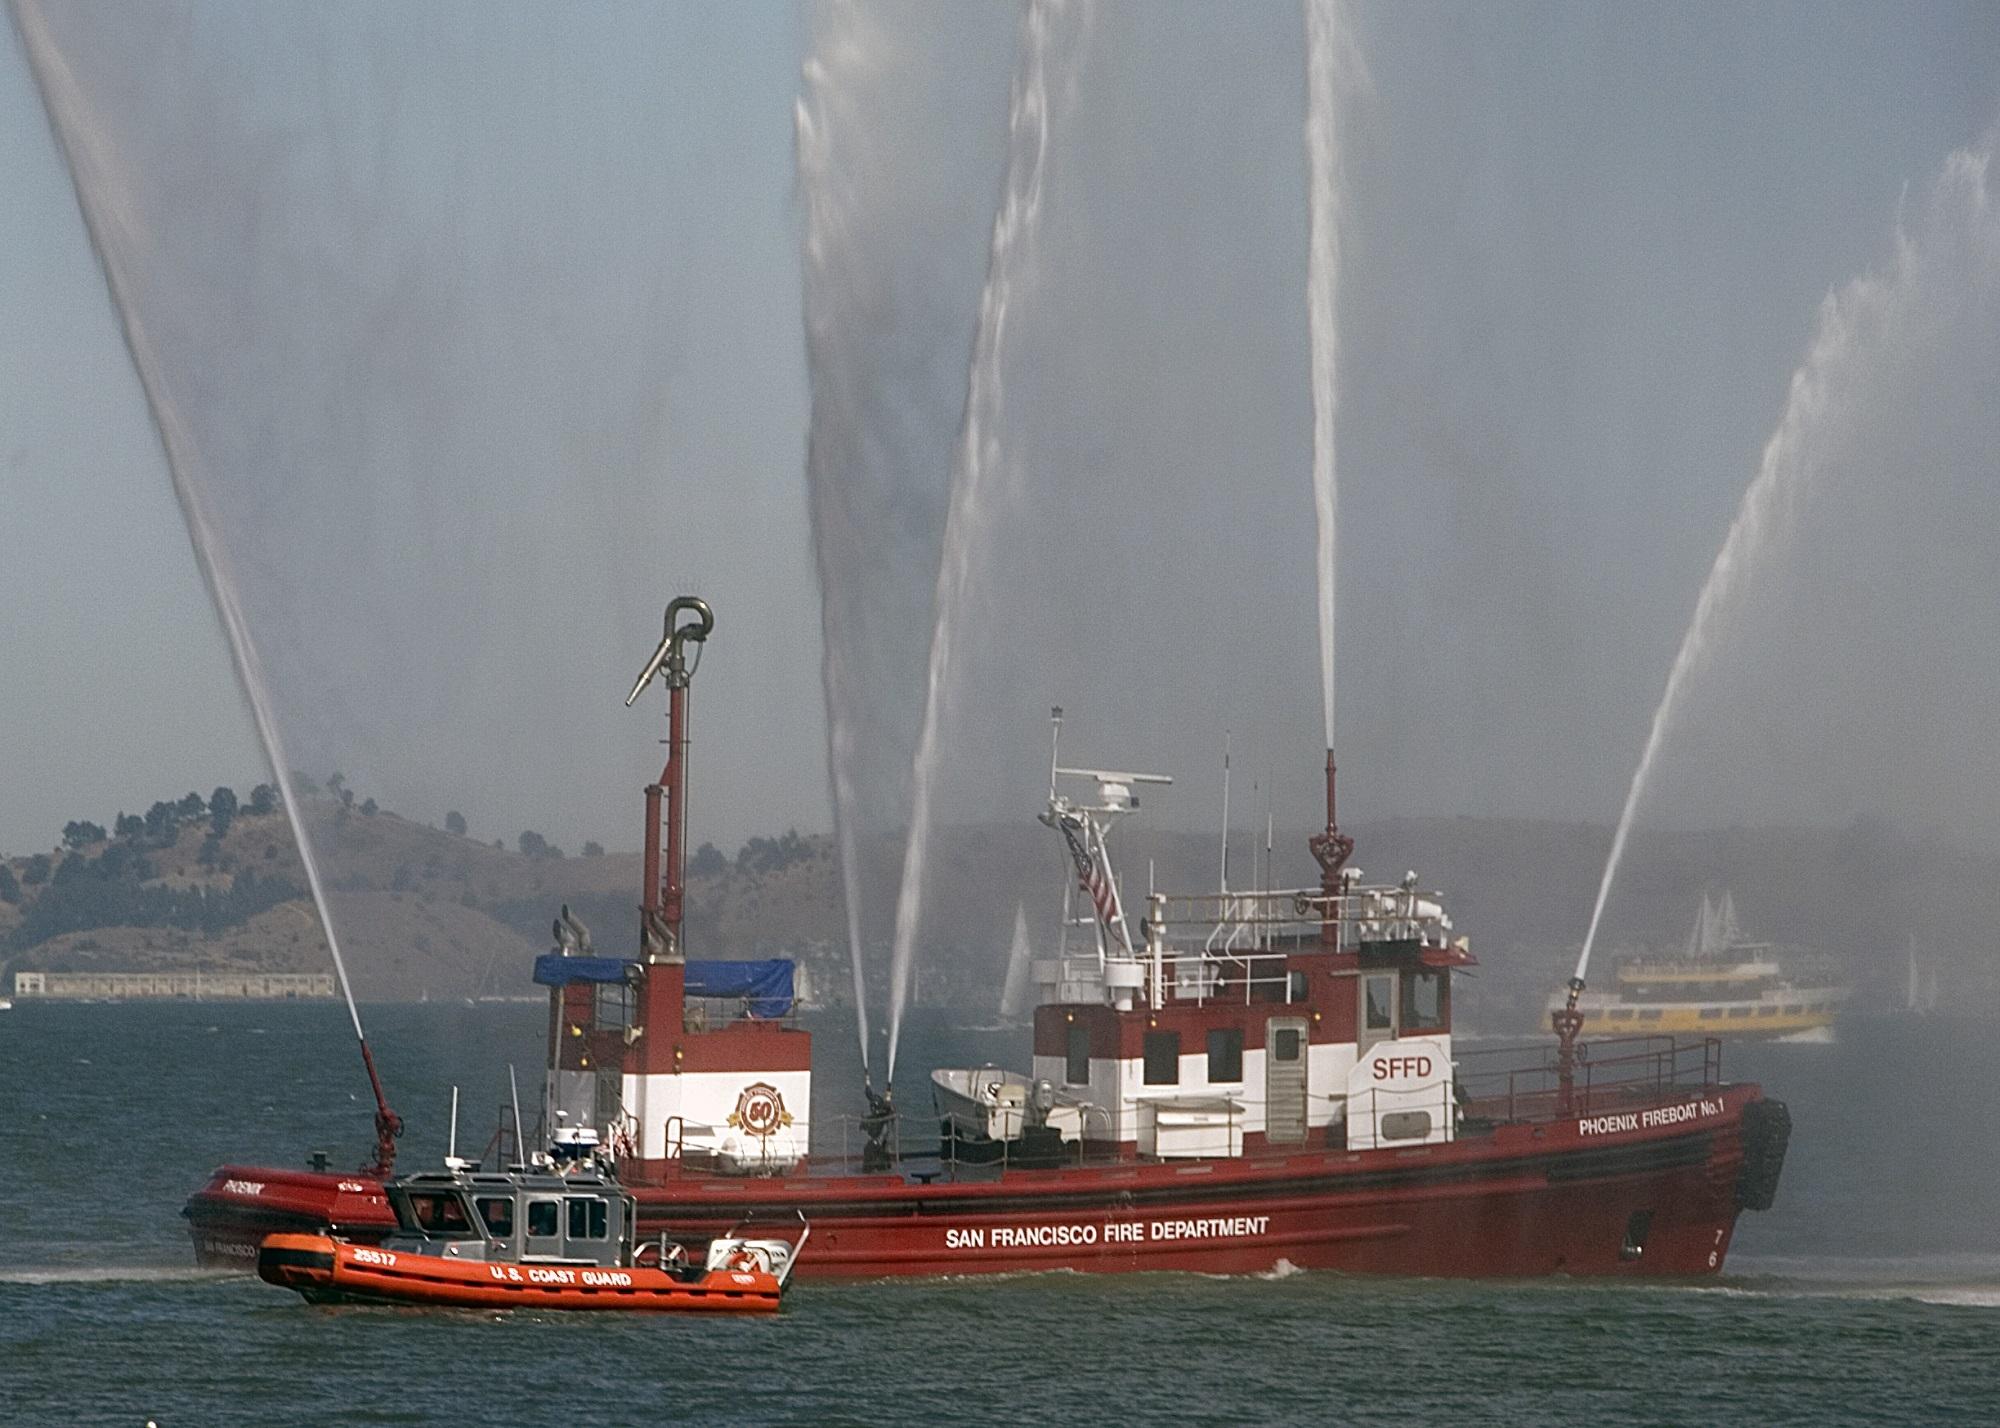 Fire Boat, Boat, Coast, Fire, Guard, HQ Photo